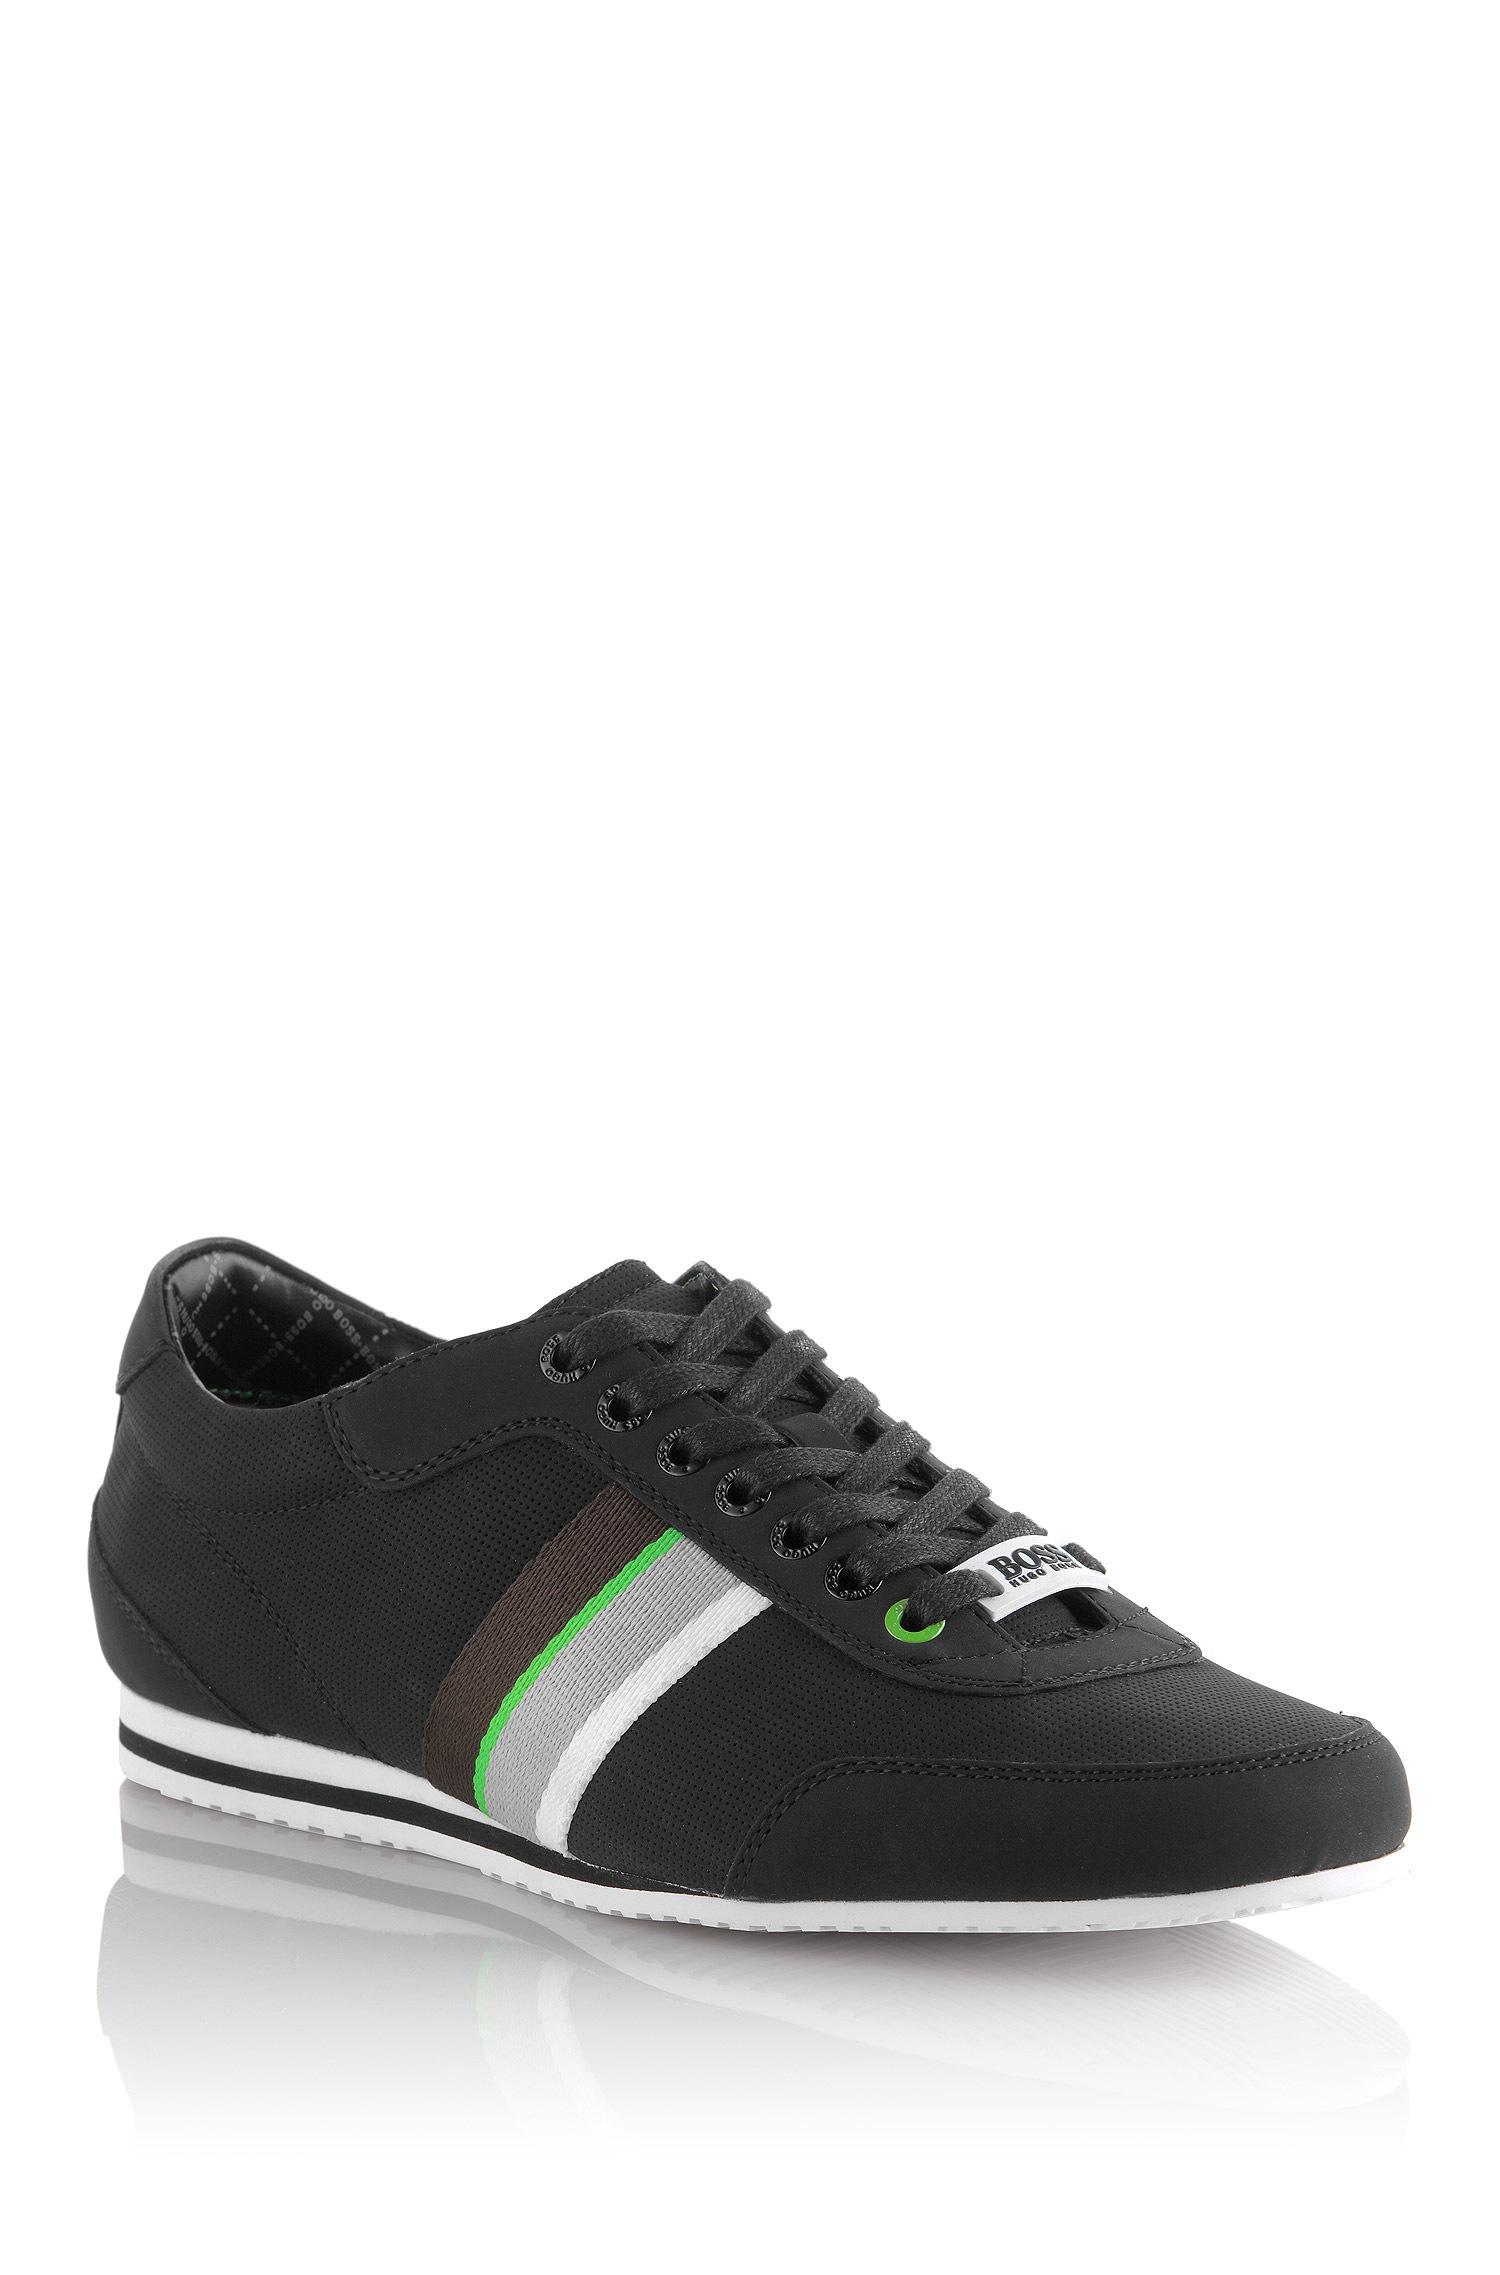 boss green suede sneakers 39 eldorado suede 39 in black for men lyst. Black Bedroom Furniture Sets. Home Design Ideas